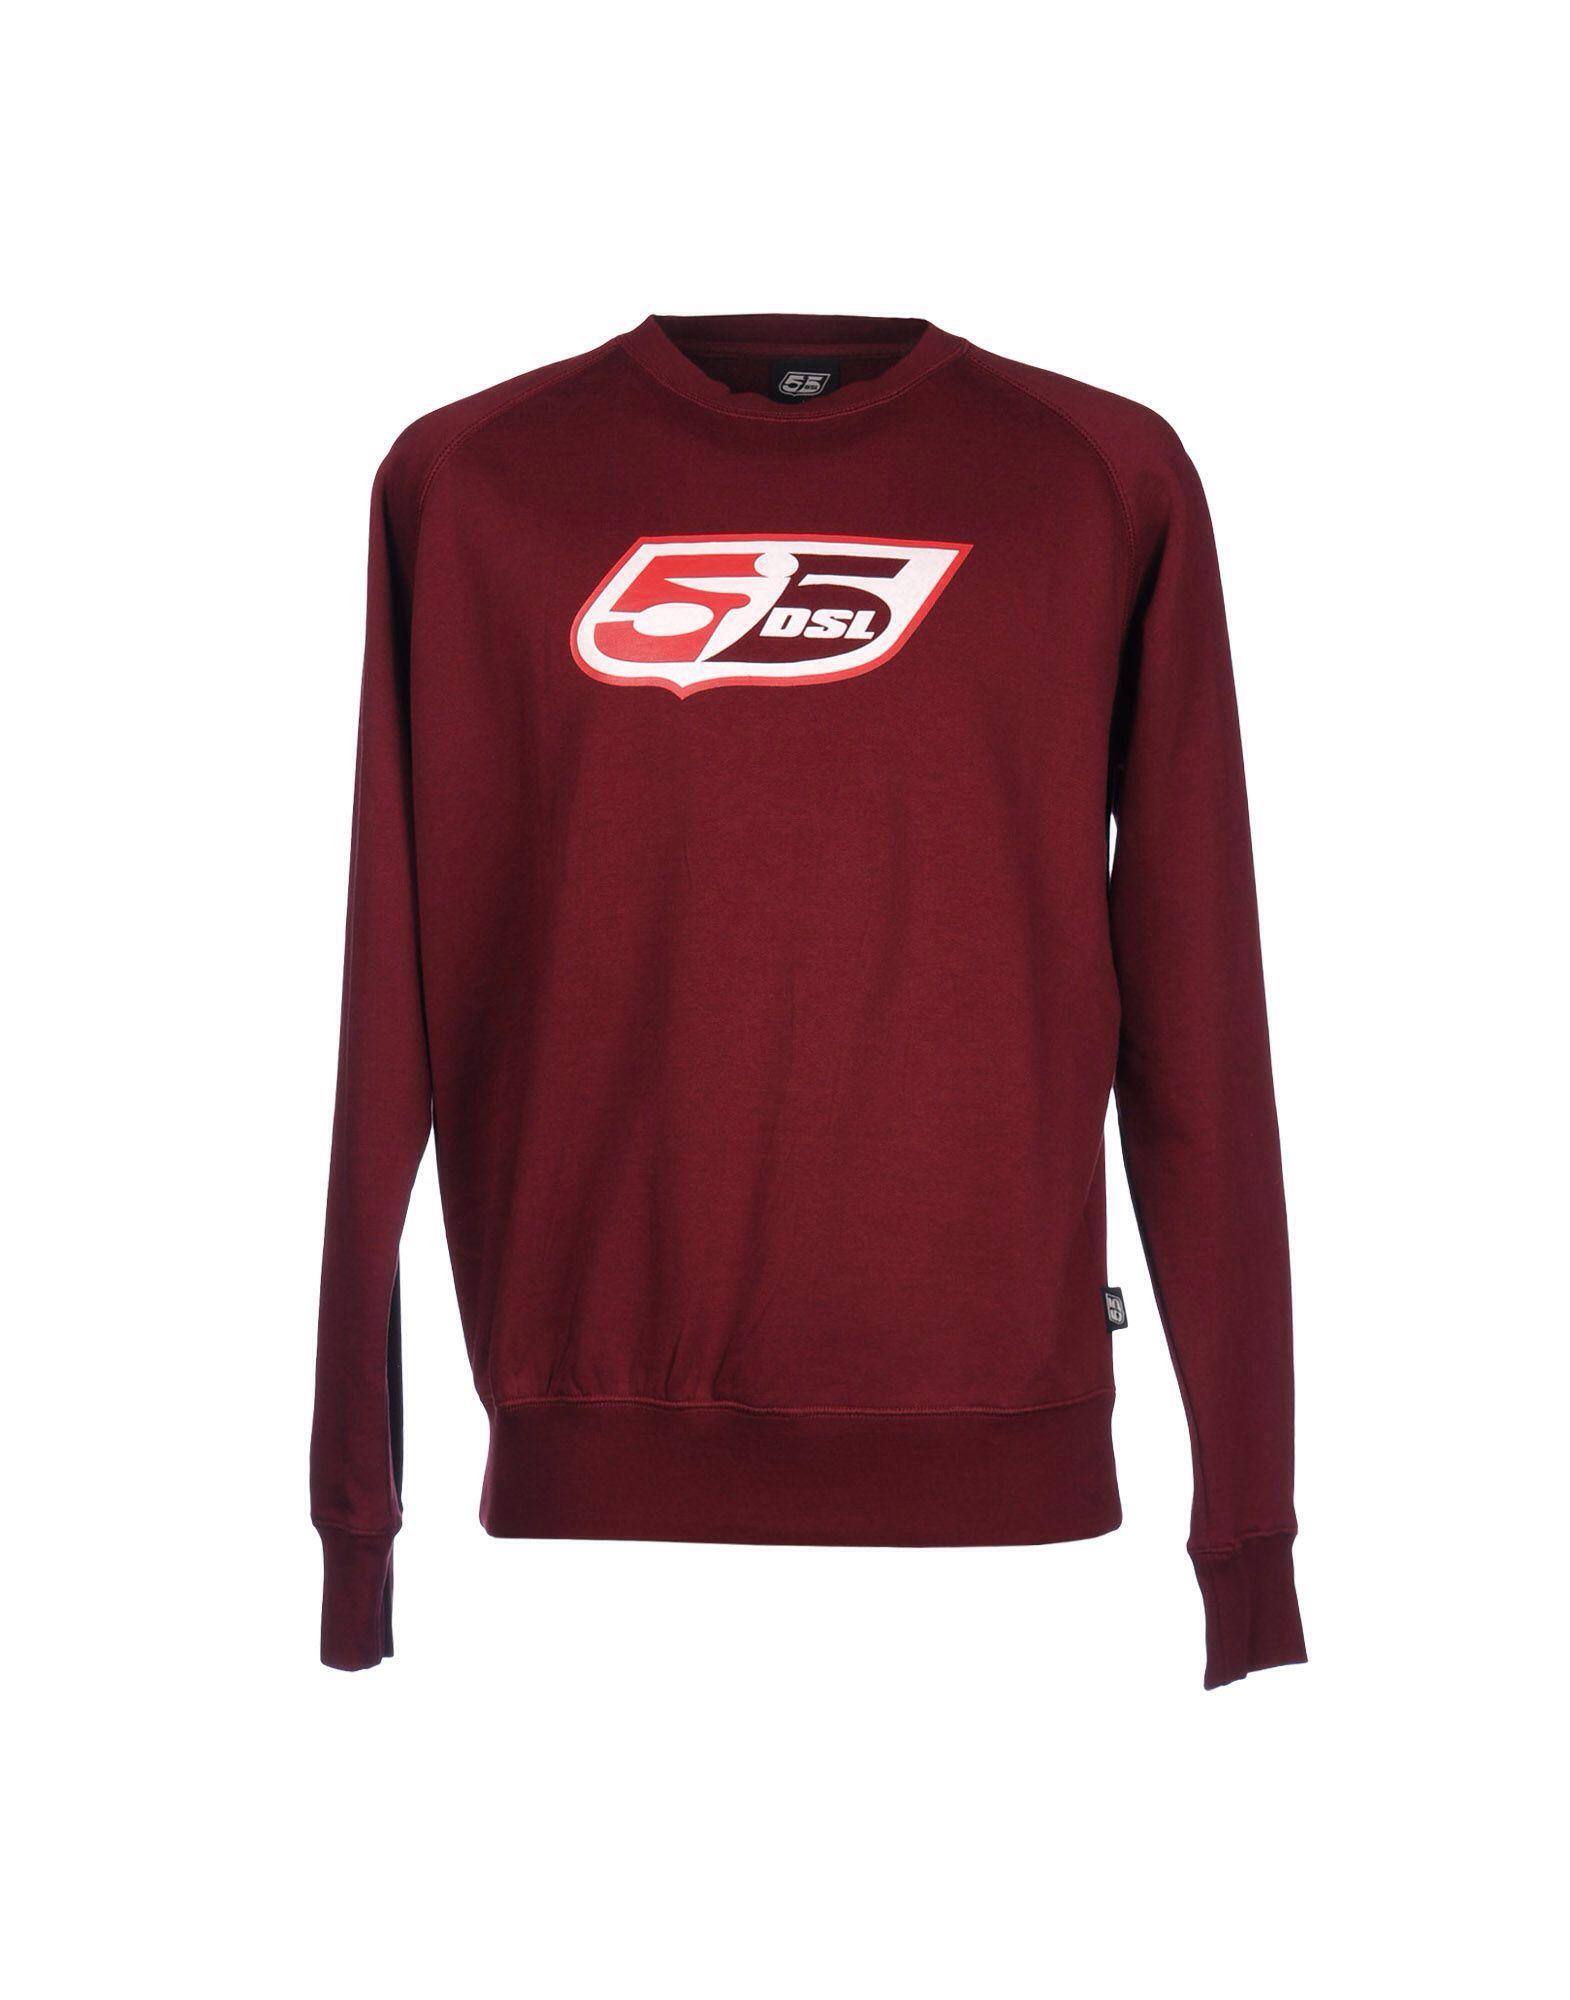 Sweatshirt · Gears · Dsl 55 Tattoo Designs Men, Shirt Designs, Clothing  Items, Cool T Shirts, 7ca344221ae8